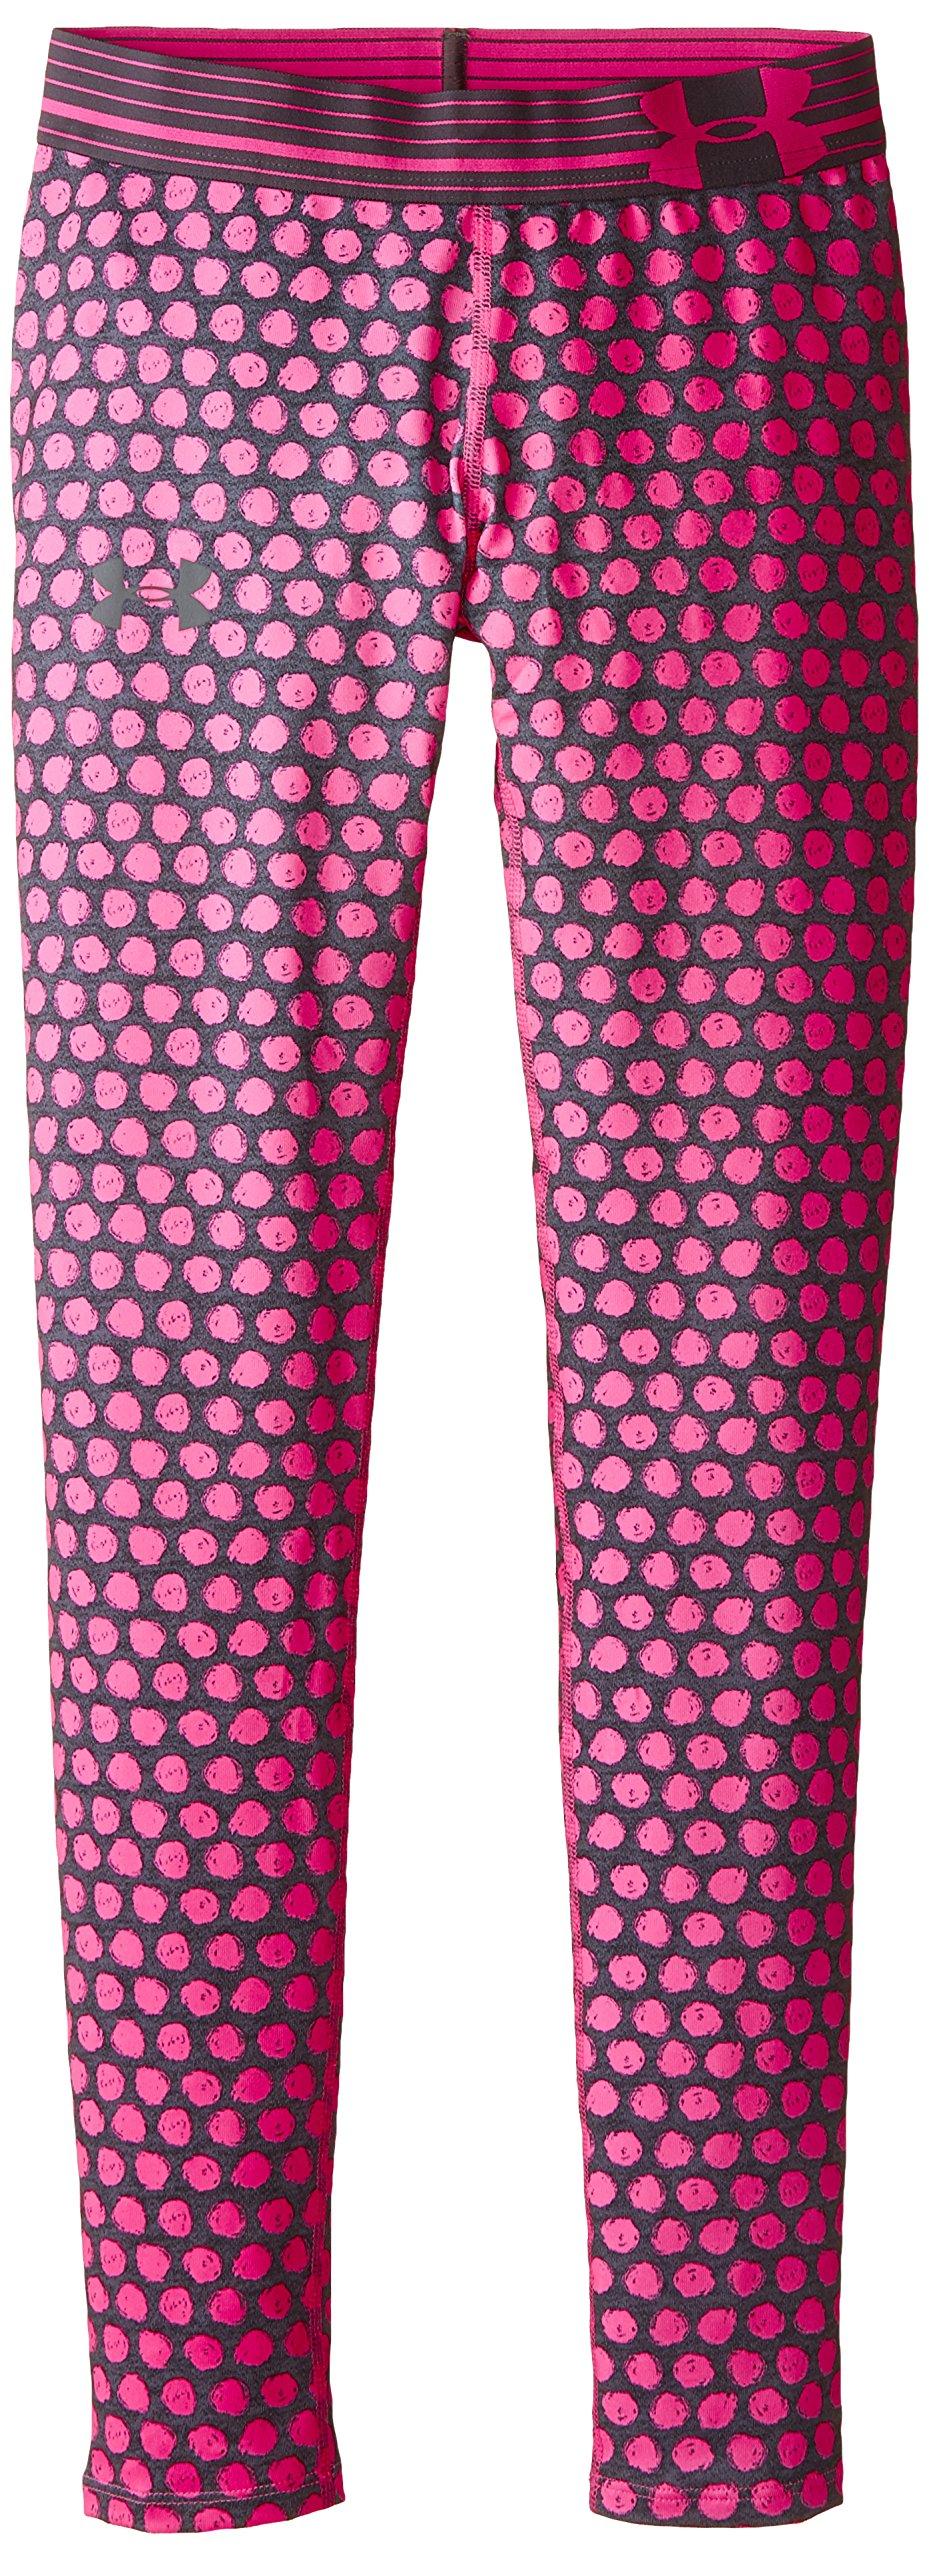 Under Armour Girls' HeatGear Armour Printed Legging, Asphalt Heather /Steel, Youth Medium